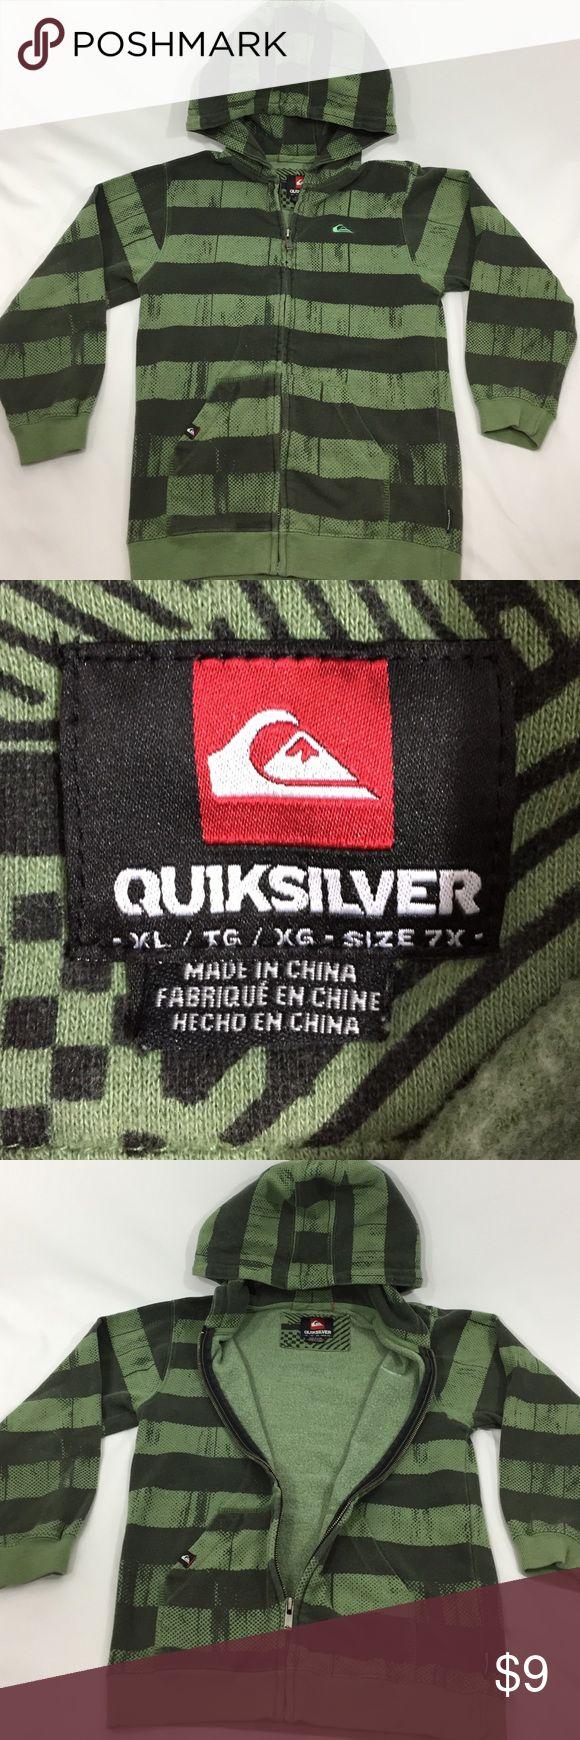 QUICKSILVER boys 7X green & black hoodie XL zip up QUICKSILVER boys 7X XL hoodie zip up with pockets. Zero flaws from a smoke and pet free home. Quicksilver Shirts & Tops Sweatshirts & Hoodies